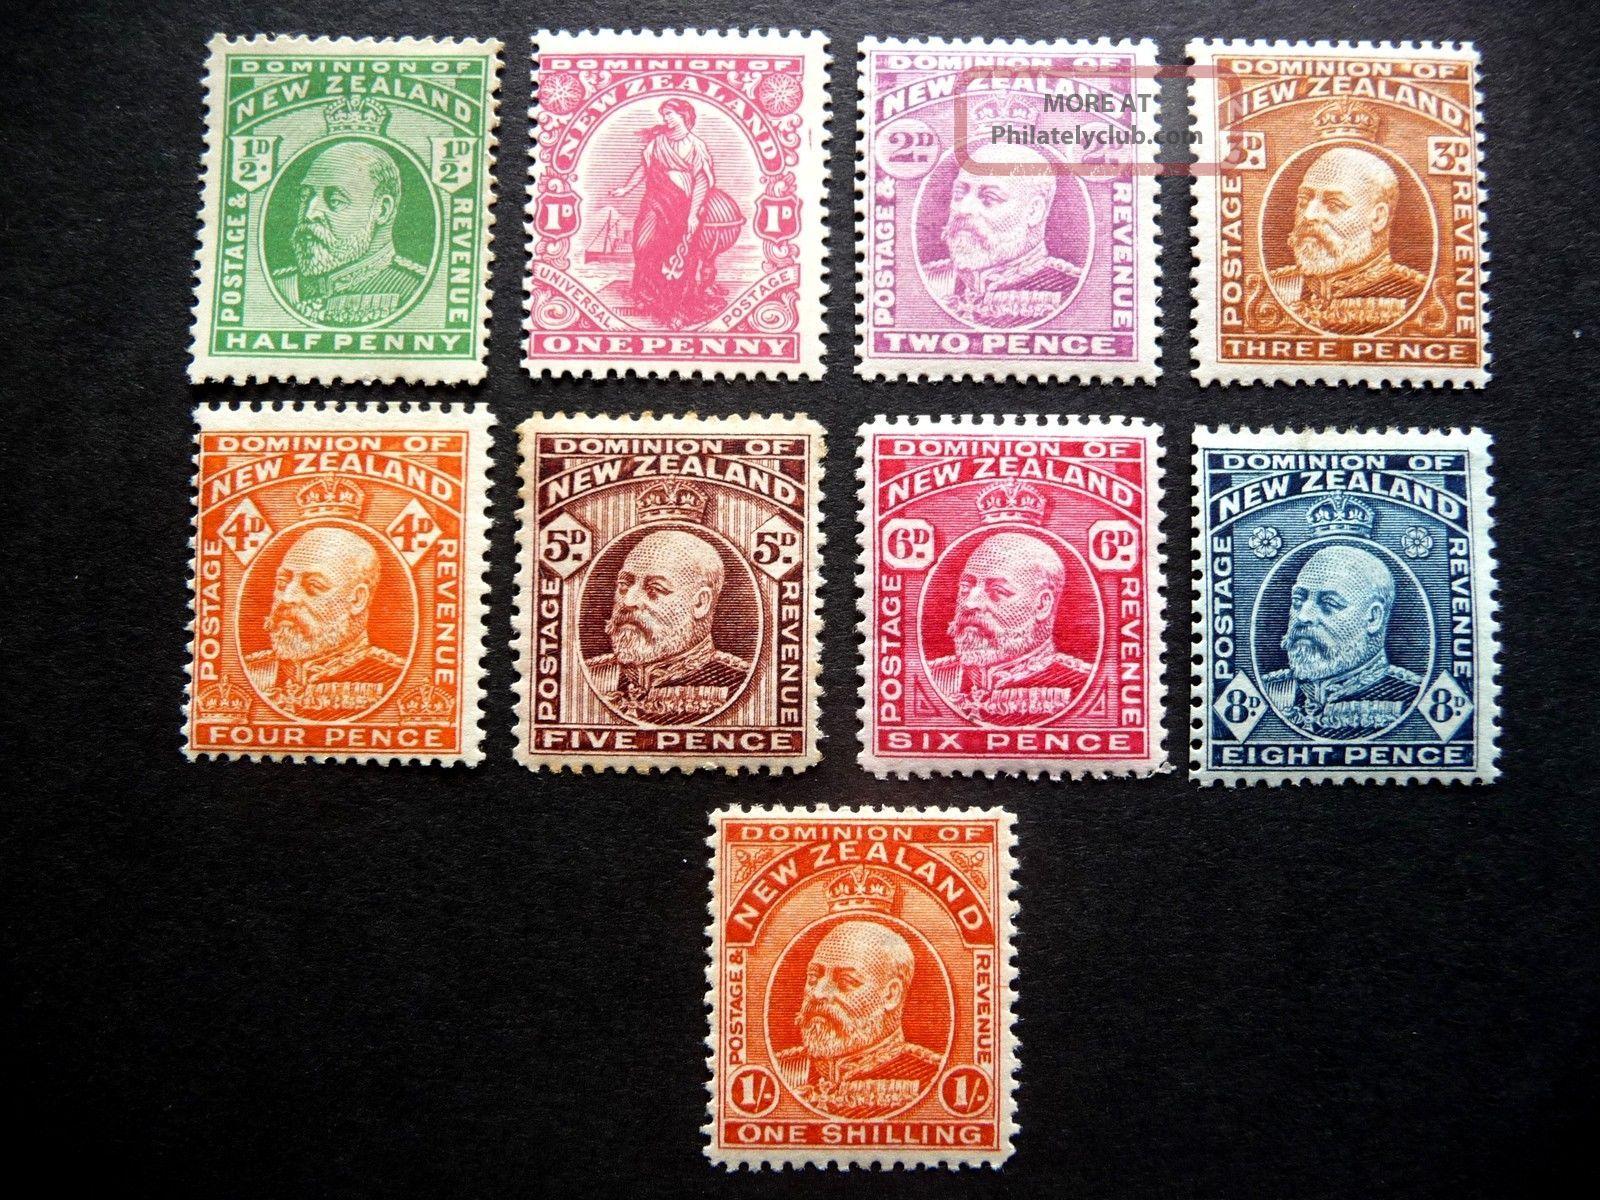 Zealand Kedvii 1909 Definitives As Seen M/m Australia & Oceania photo